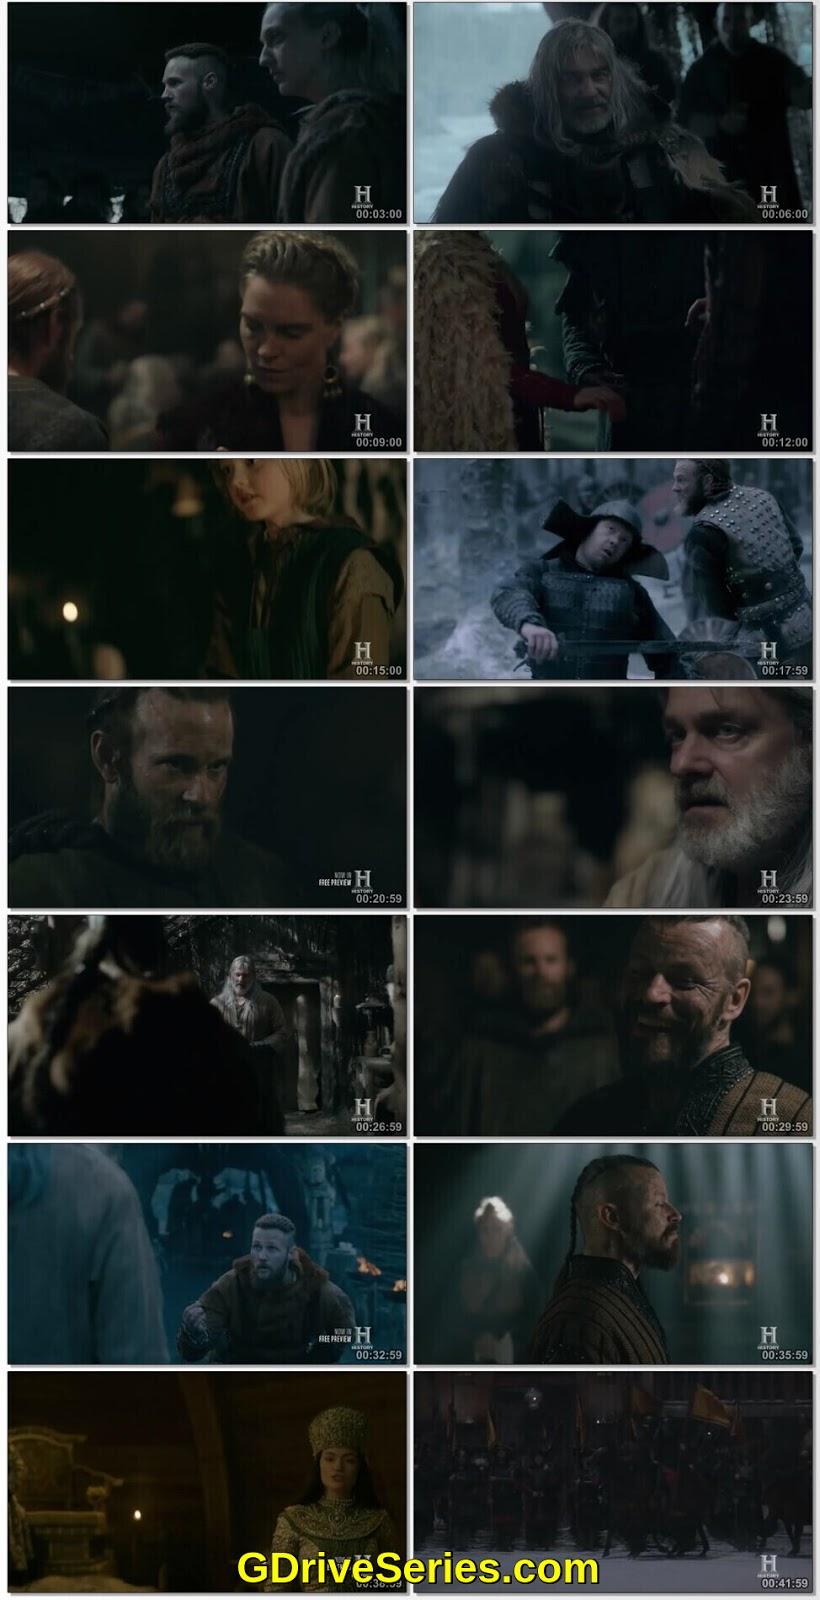 Vikings Season 6 Hindi Dubbed Download English Dual Index Of Google Drive 480p 720p 1080p Download Google Drive Web Series